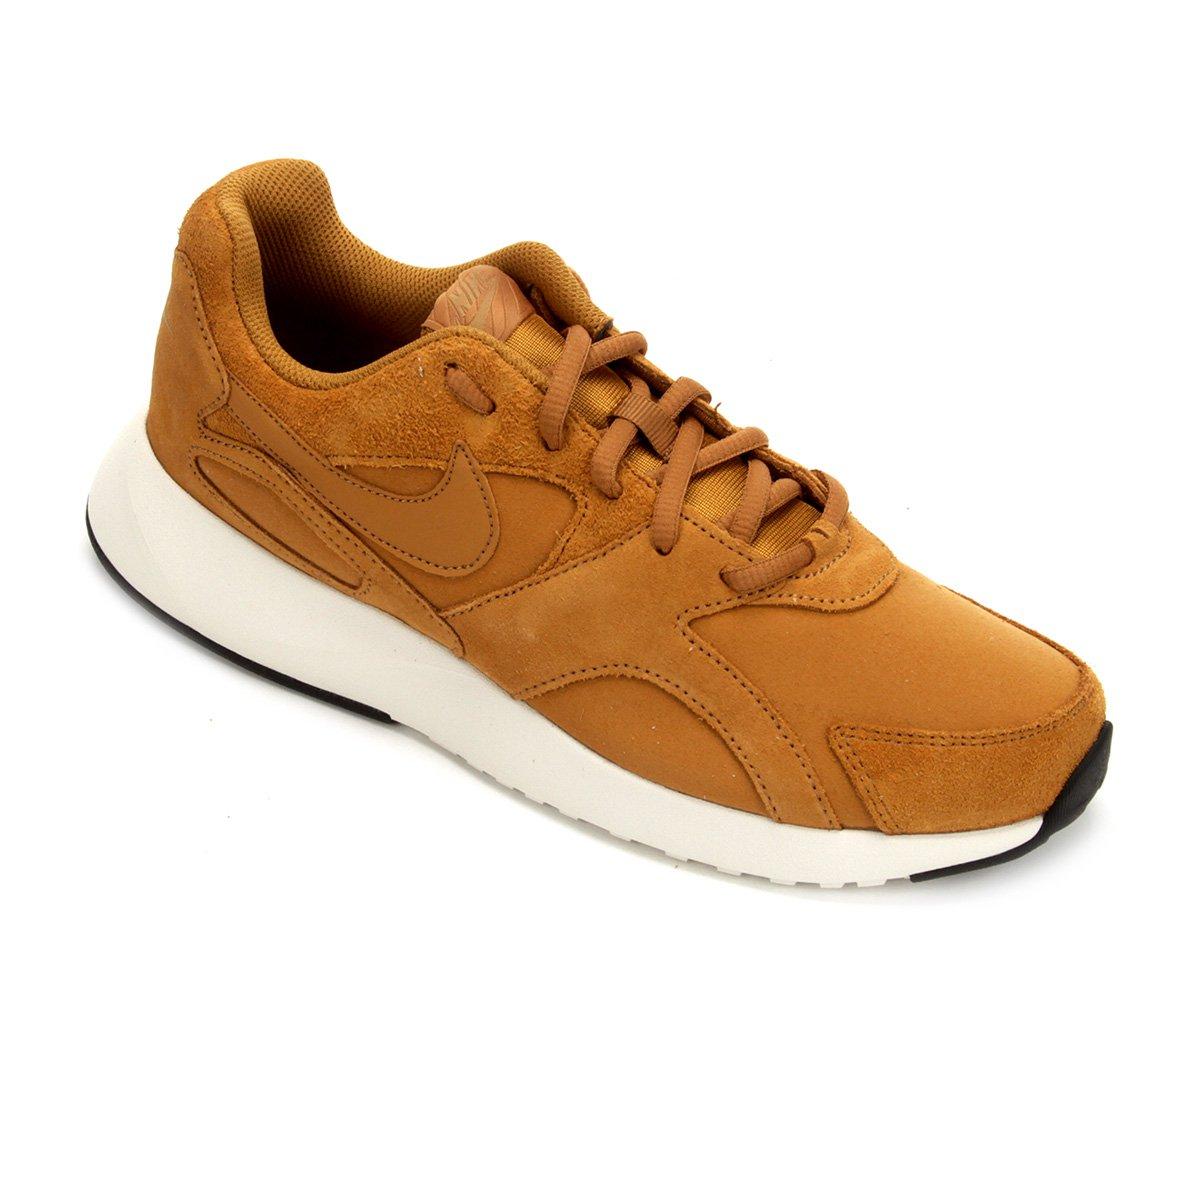 Tênis Nike Pantheos Se Masculino - Caramelo - Compre Agora  19ce33e392fea